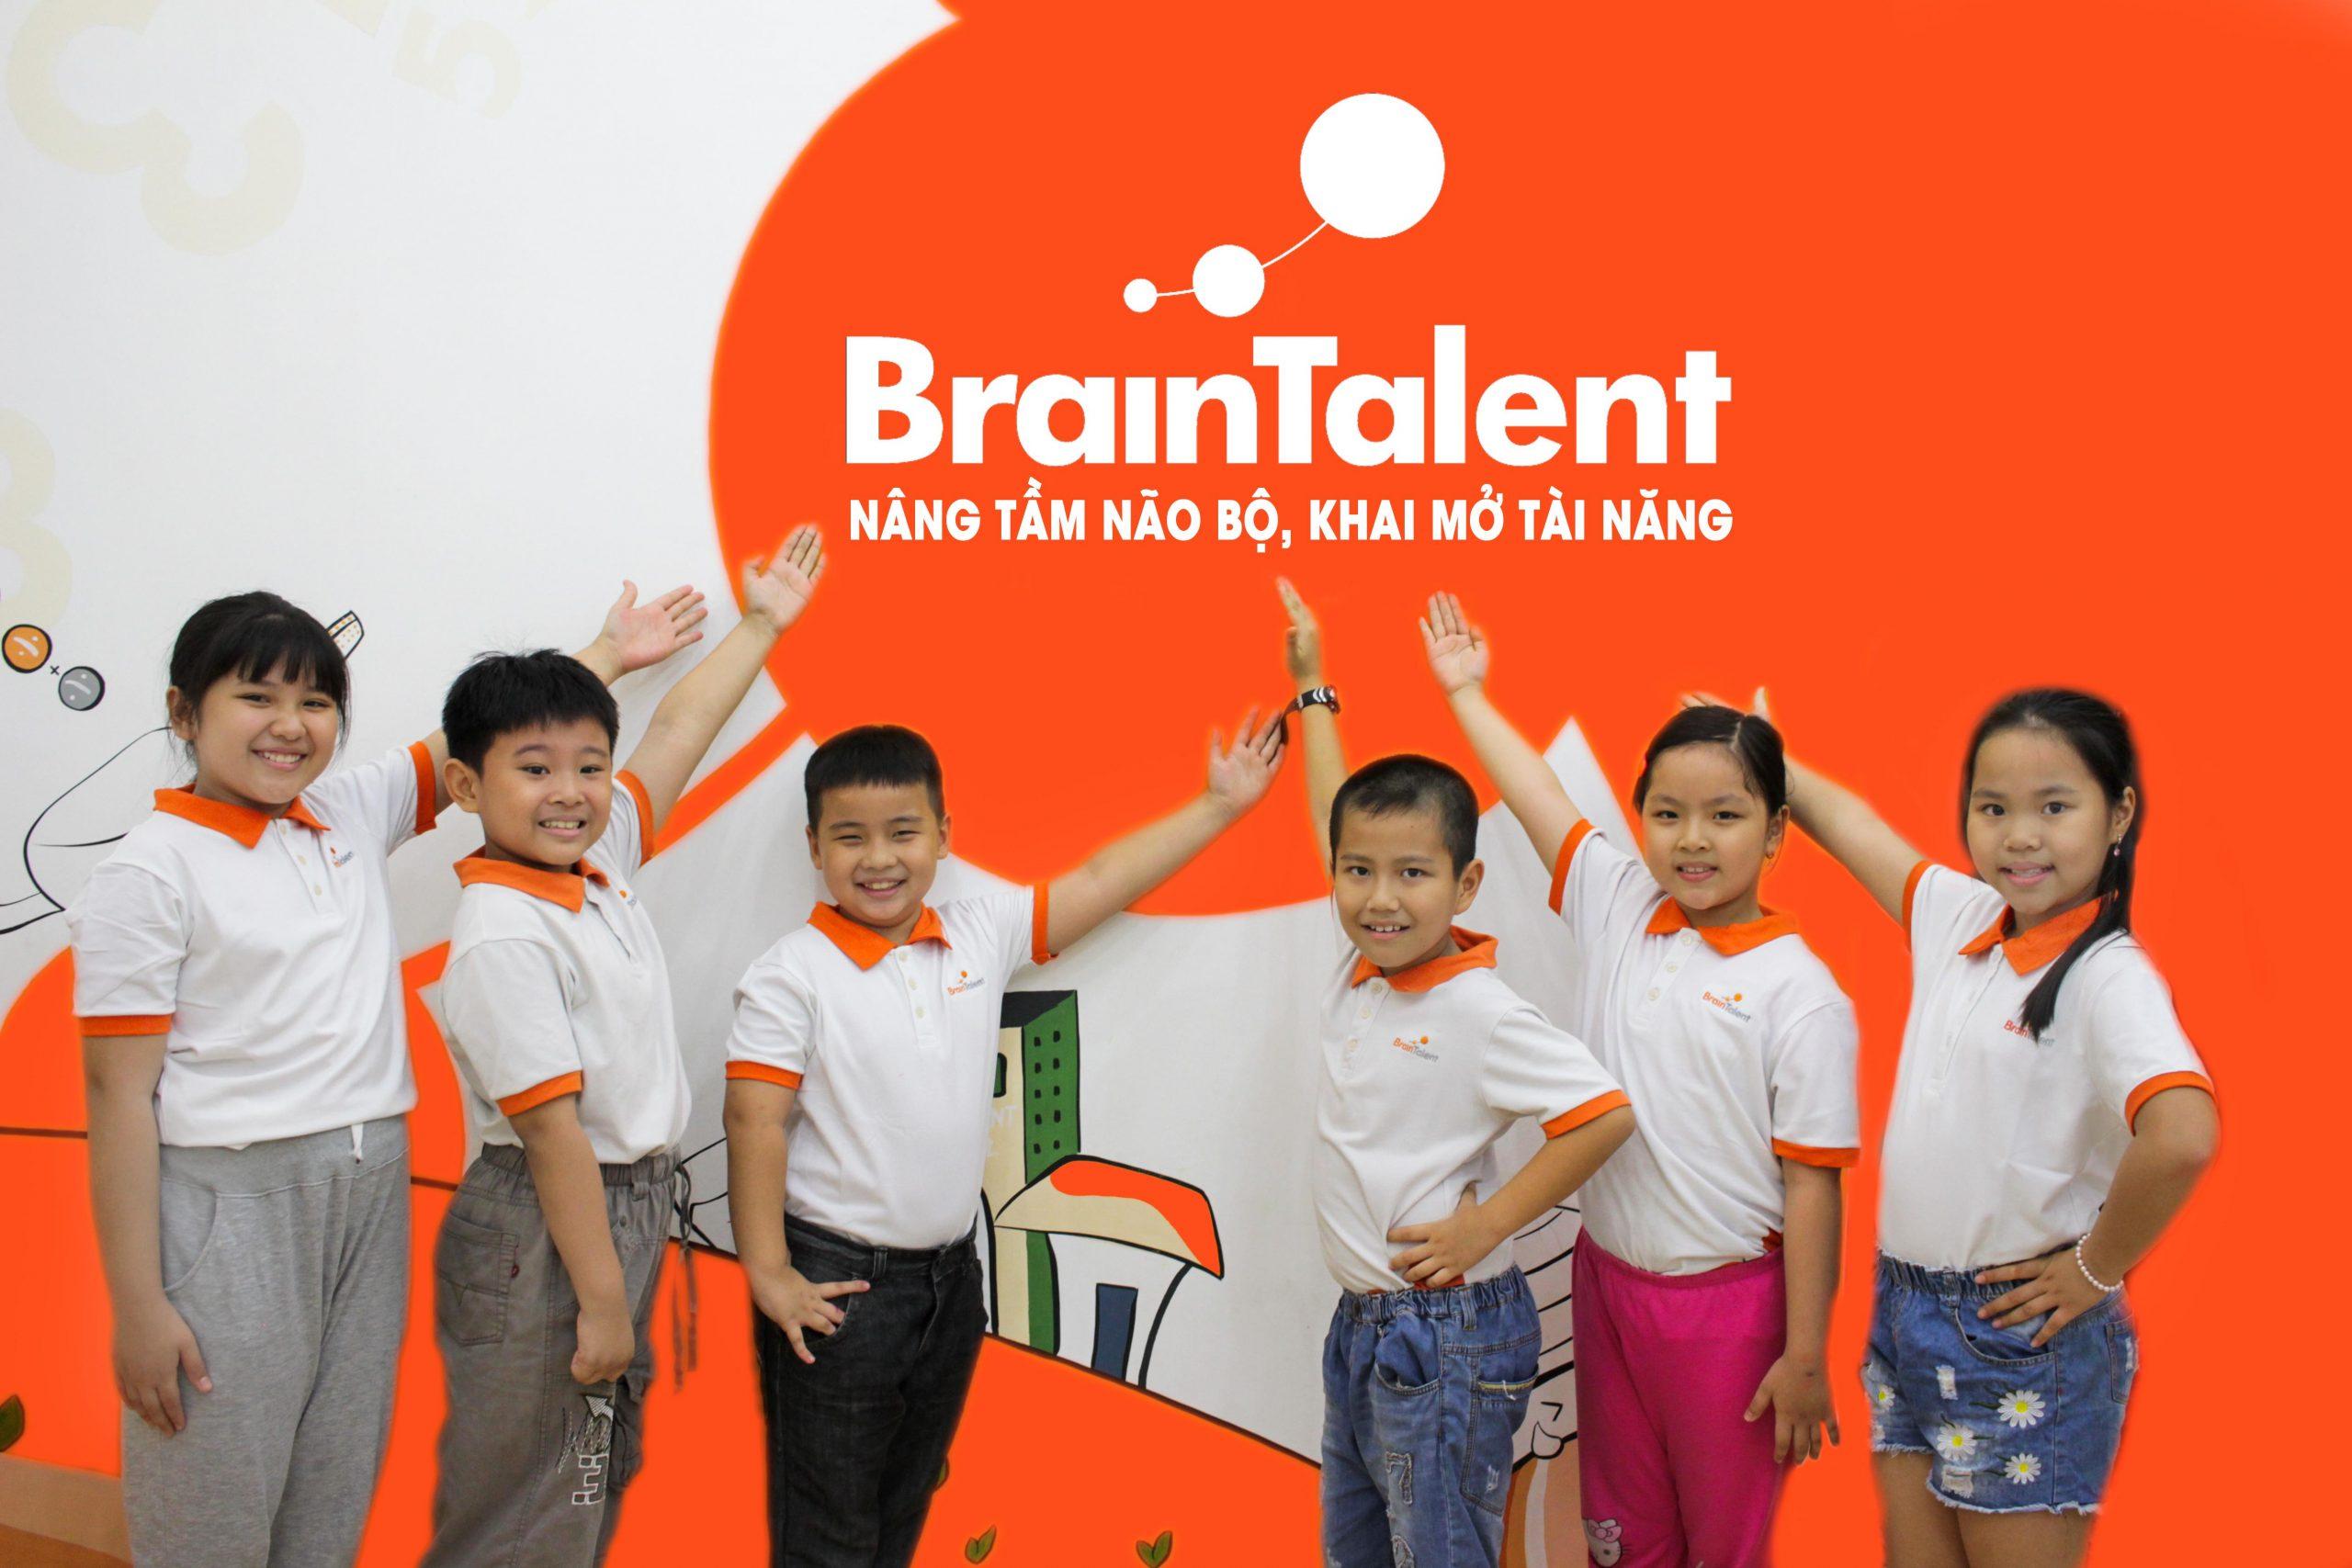 Toán phát triển trí tuệ BrainTalent